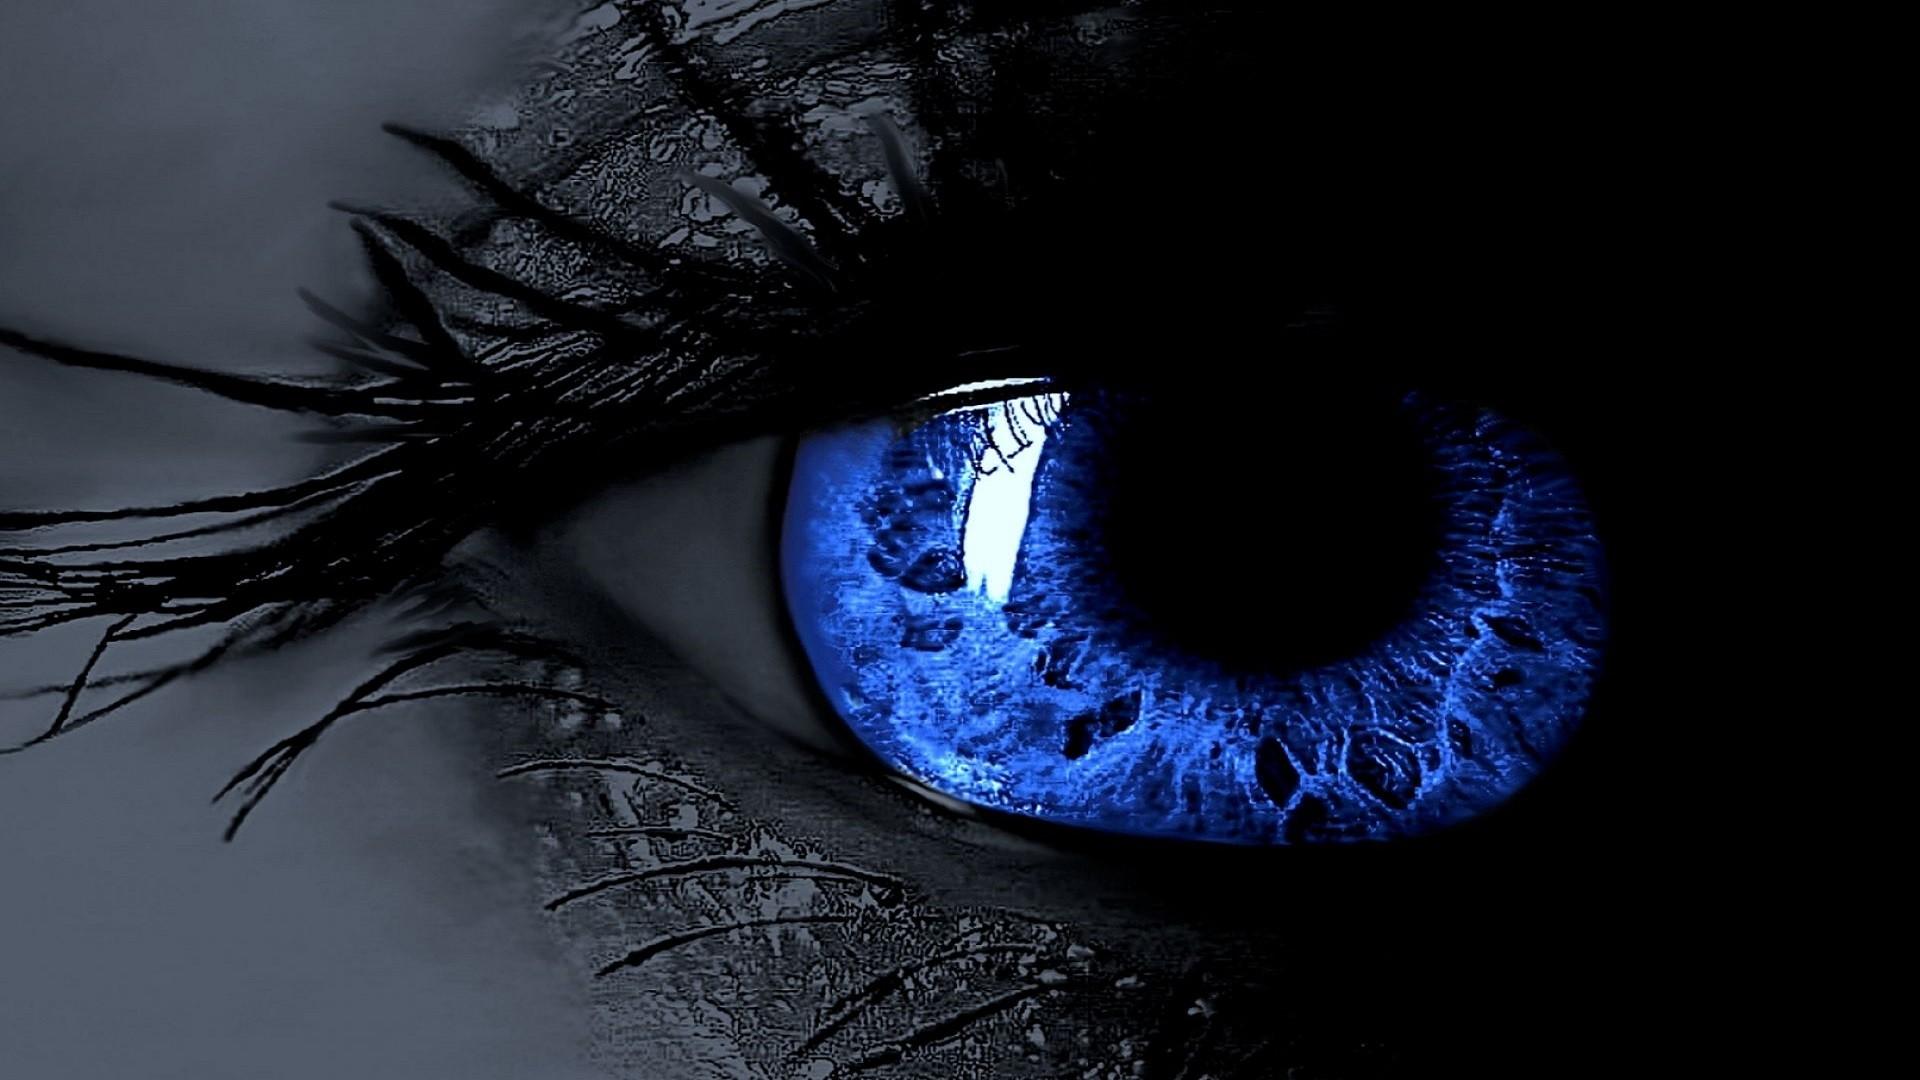 3d-romantic-blue-eyes-wallpaper-free-hd